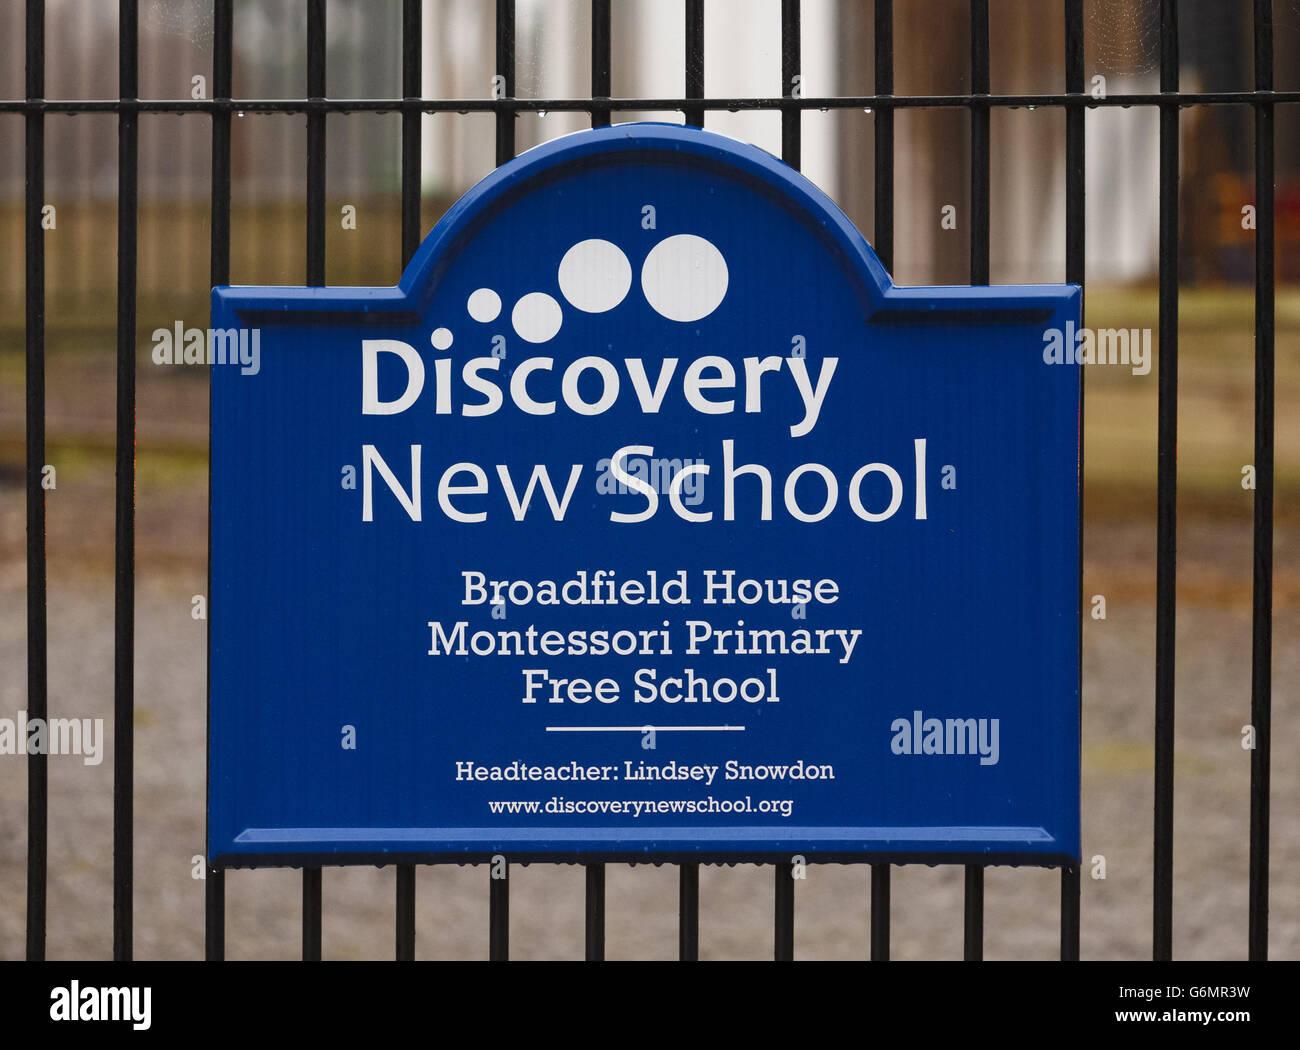 Failing Free School ordered to shut - Stock Image